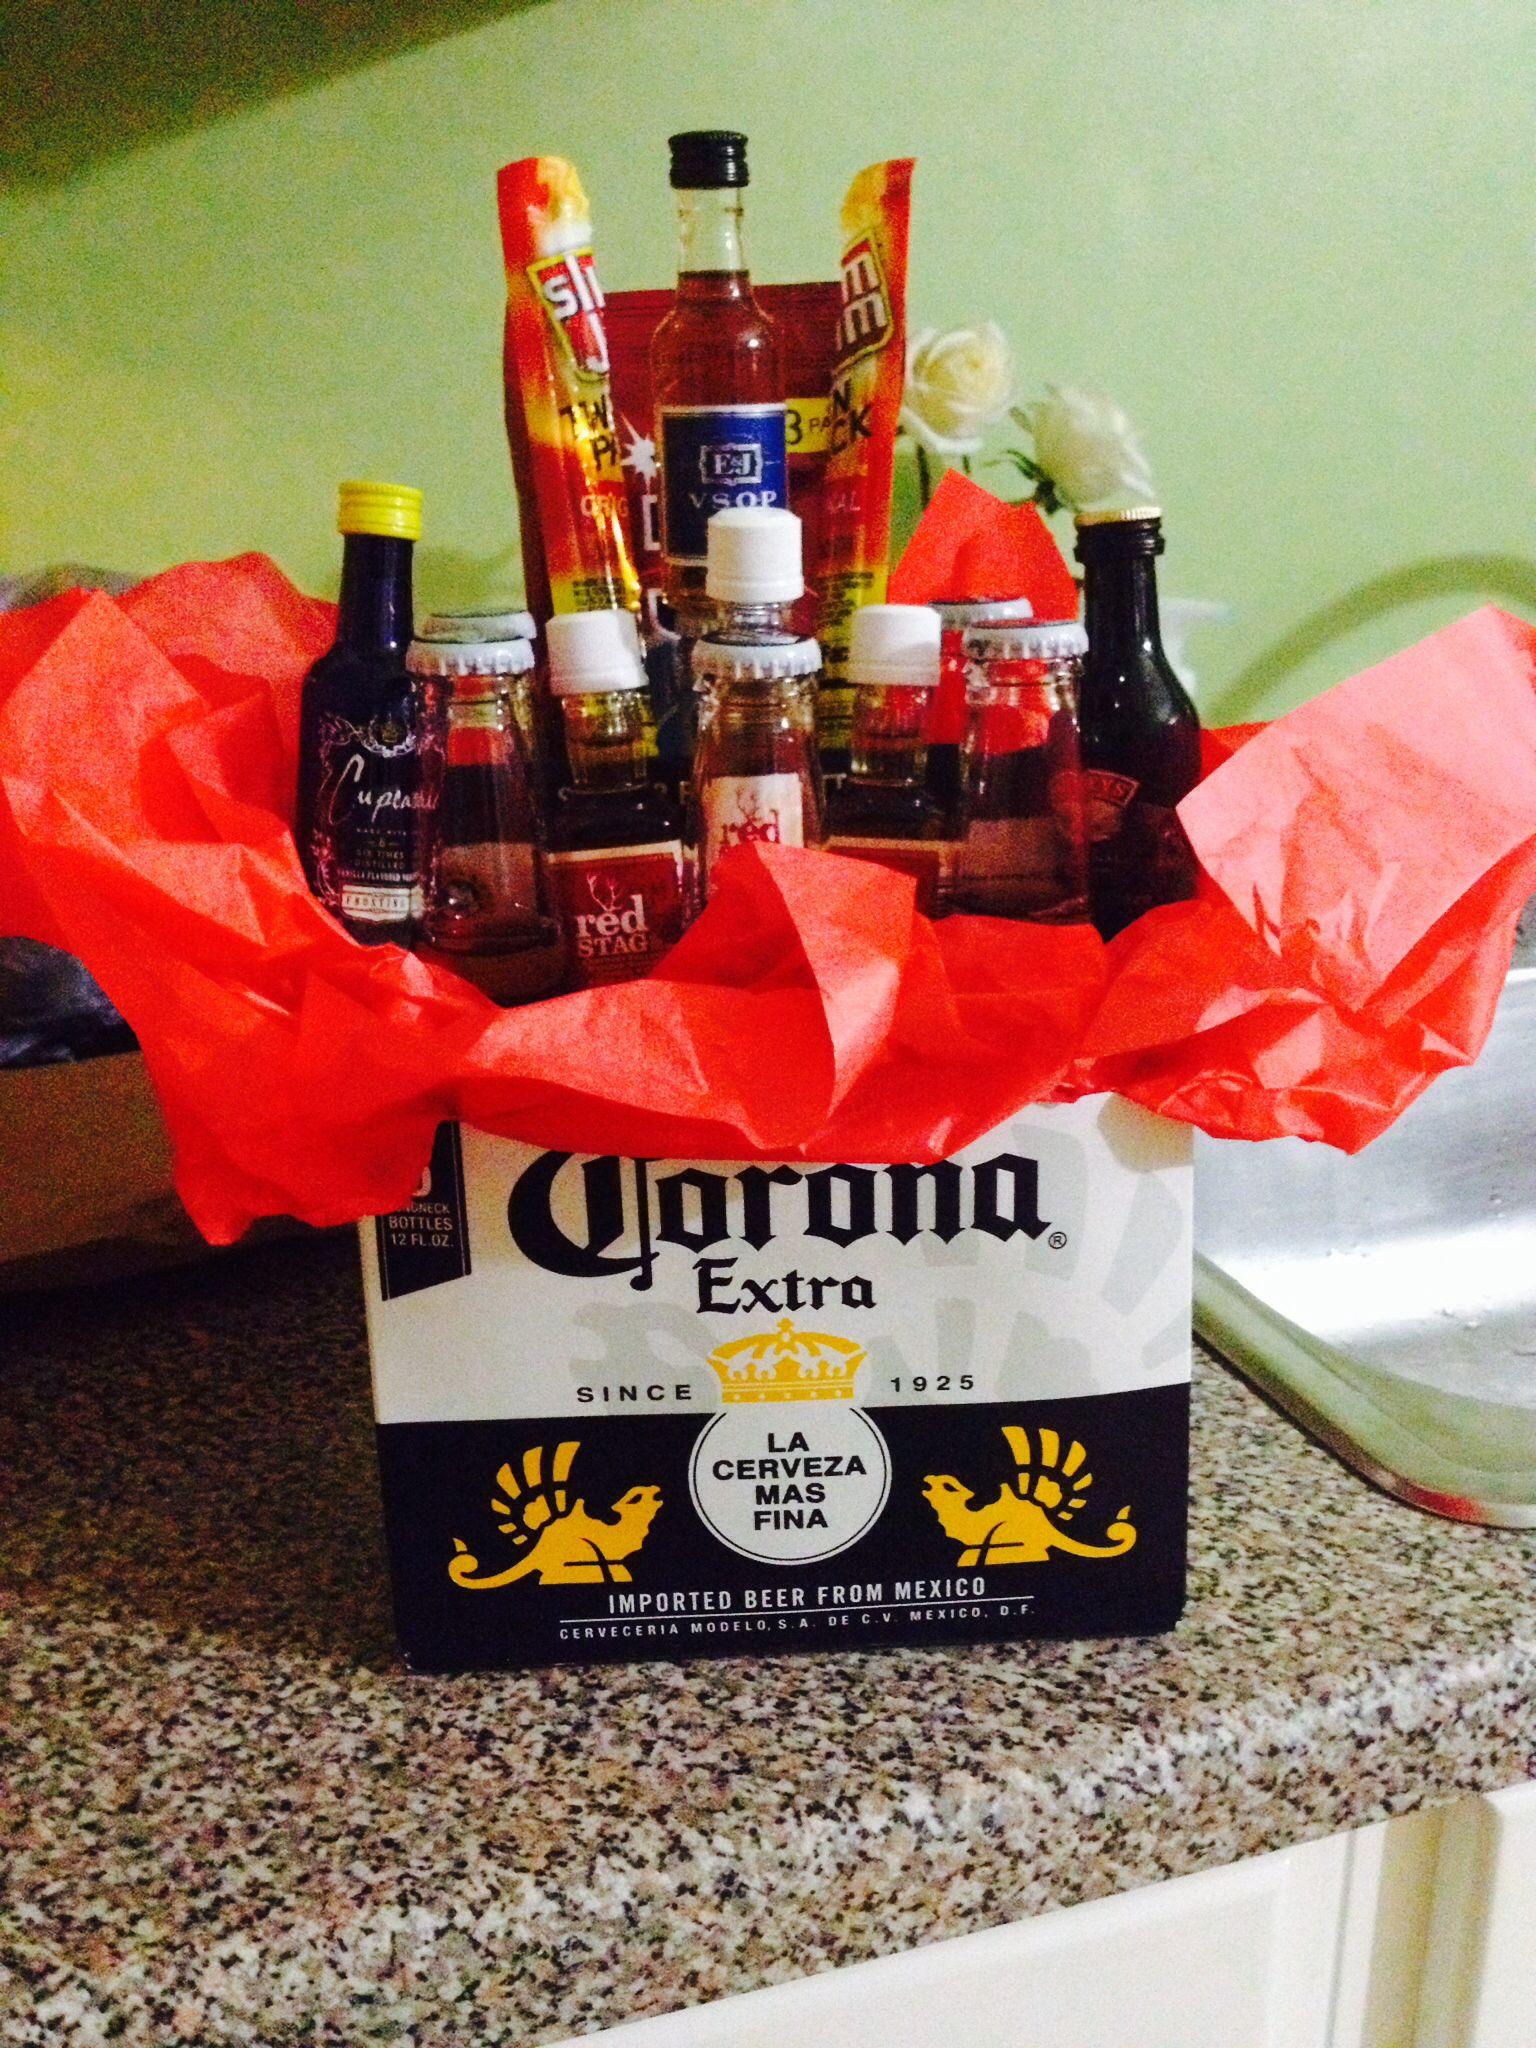 21st birthday gift for guys diy 21st birthday gifts